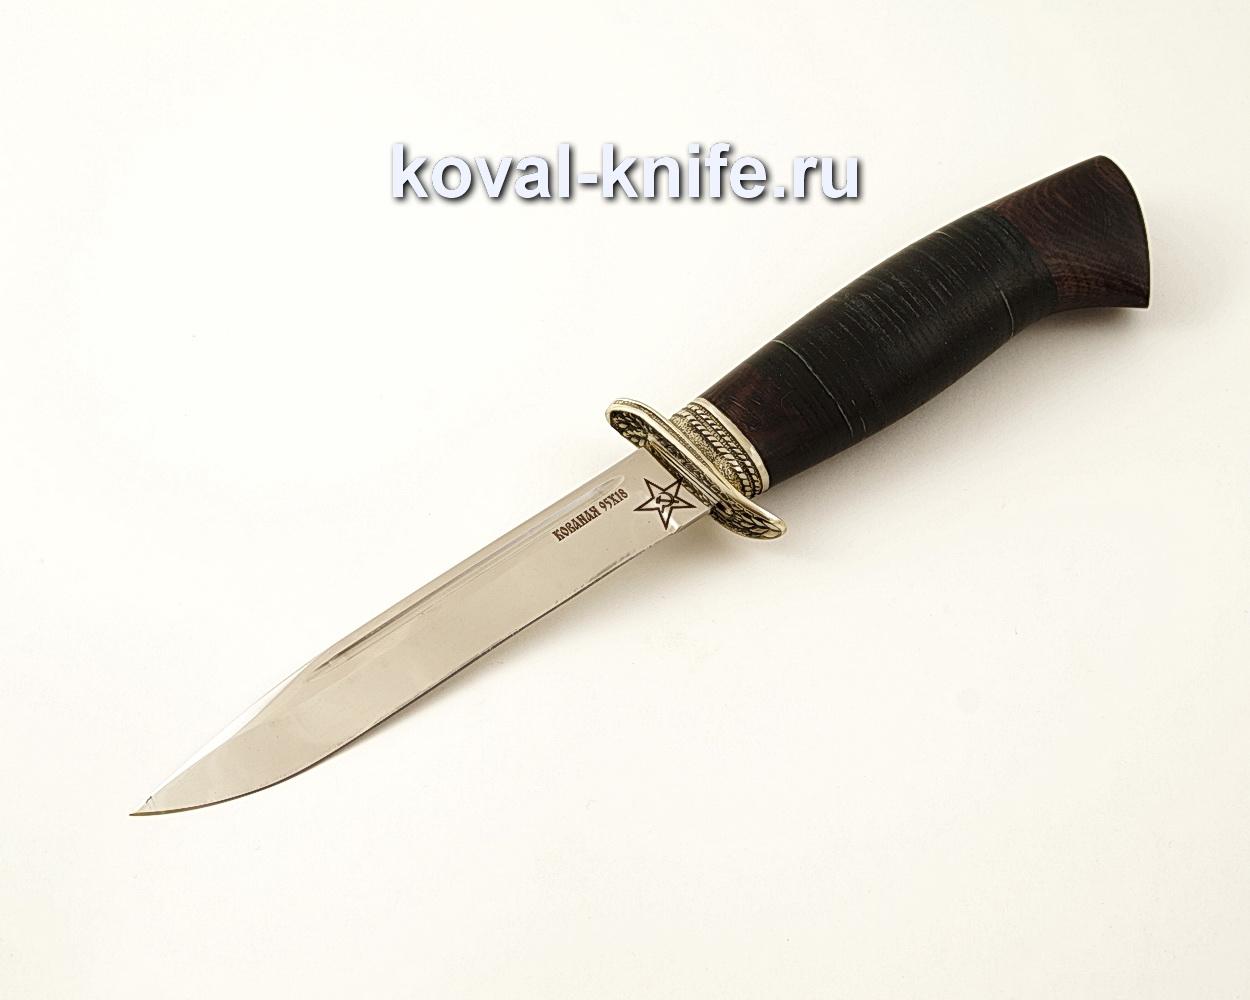 Нож Штрафбат – реплика ножа НР40 из кованой стали 95х18 с рукоятью из кожи и граба A589